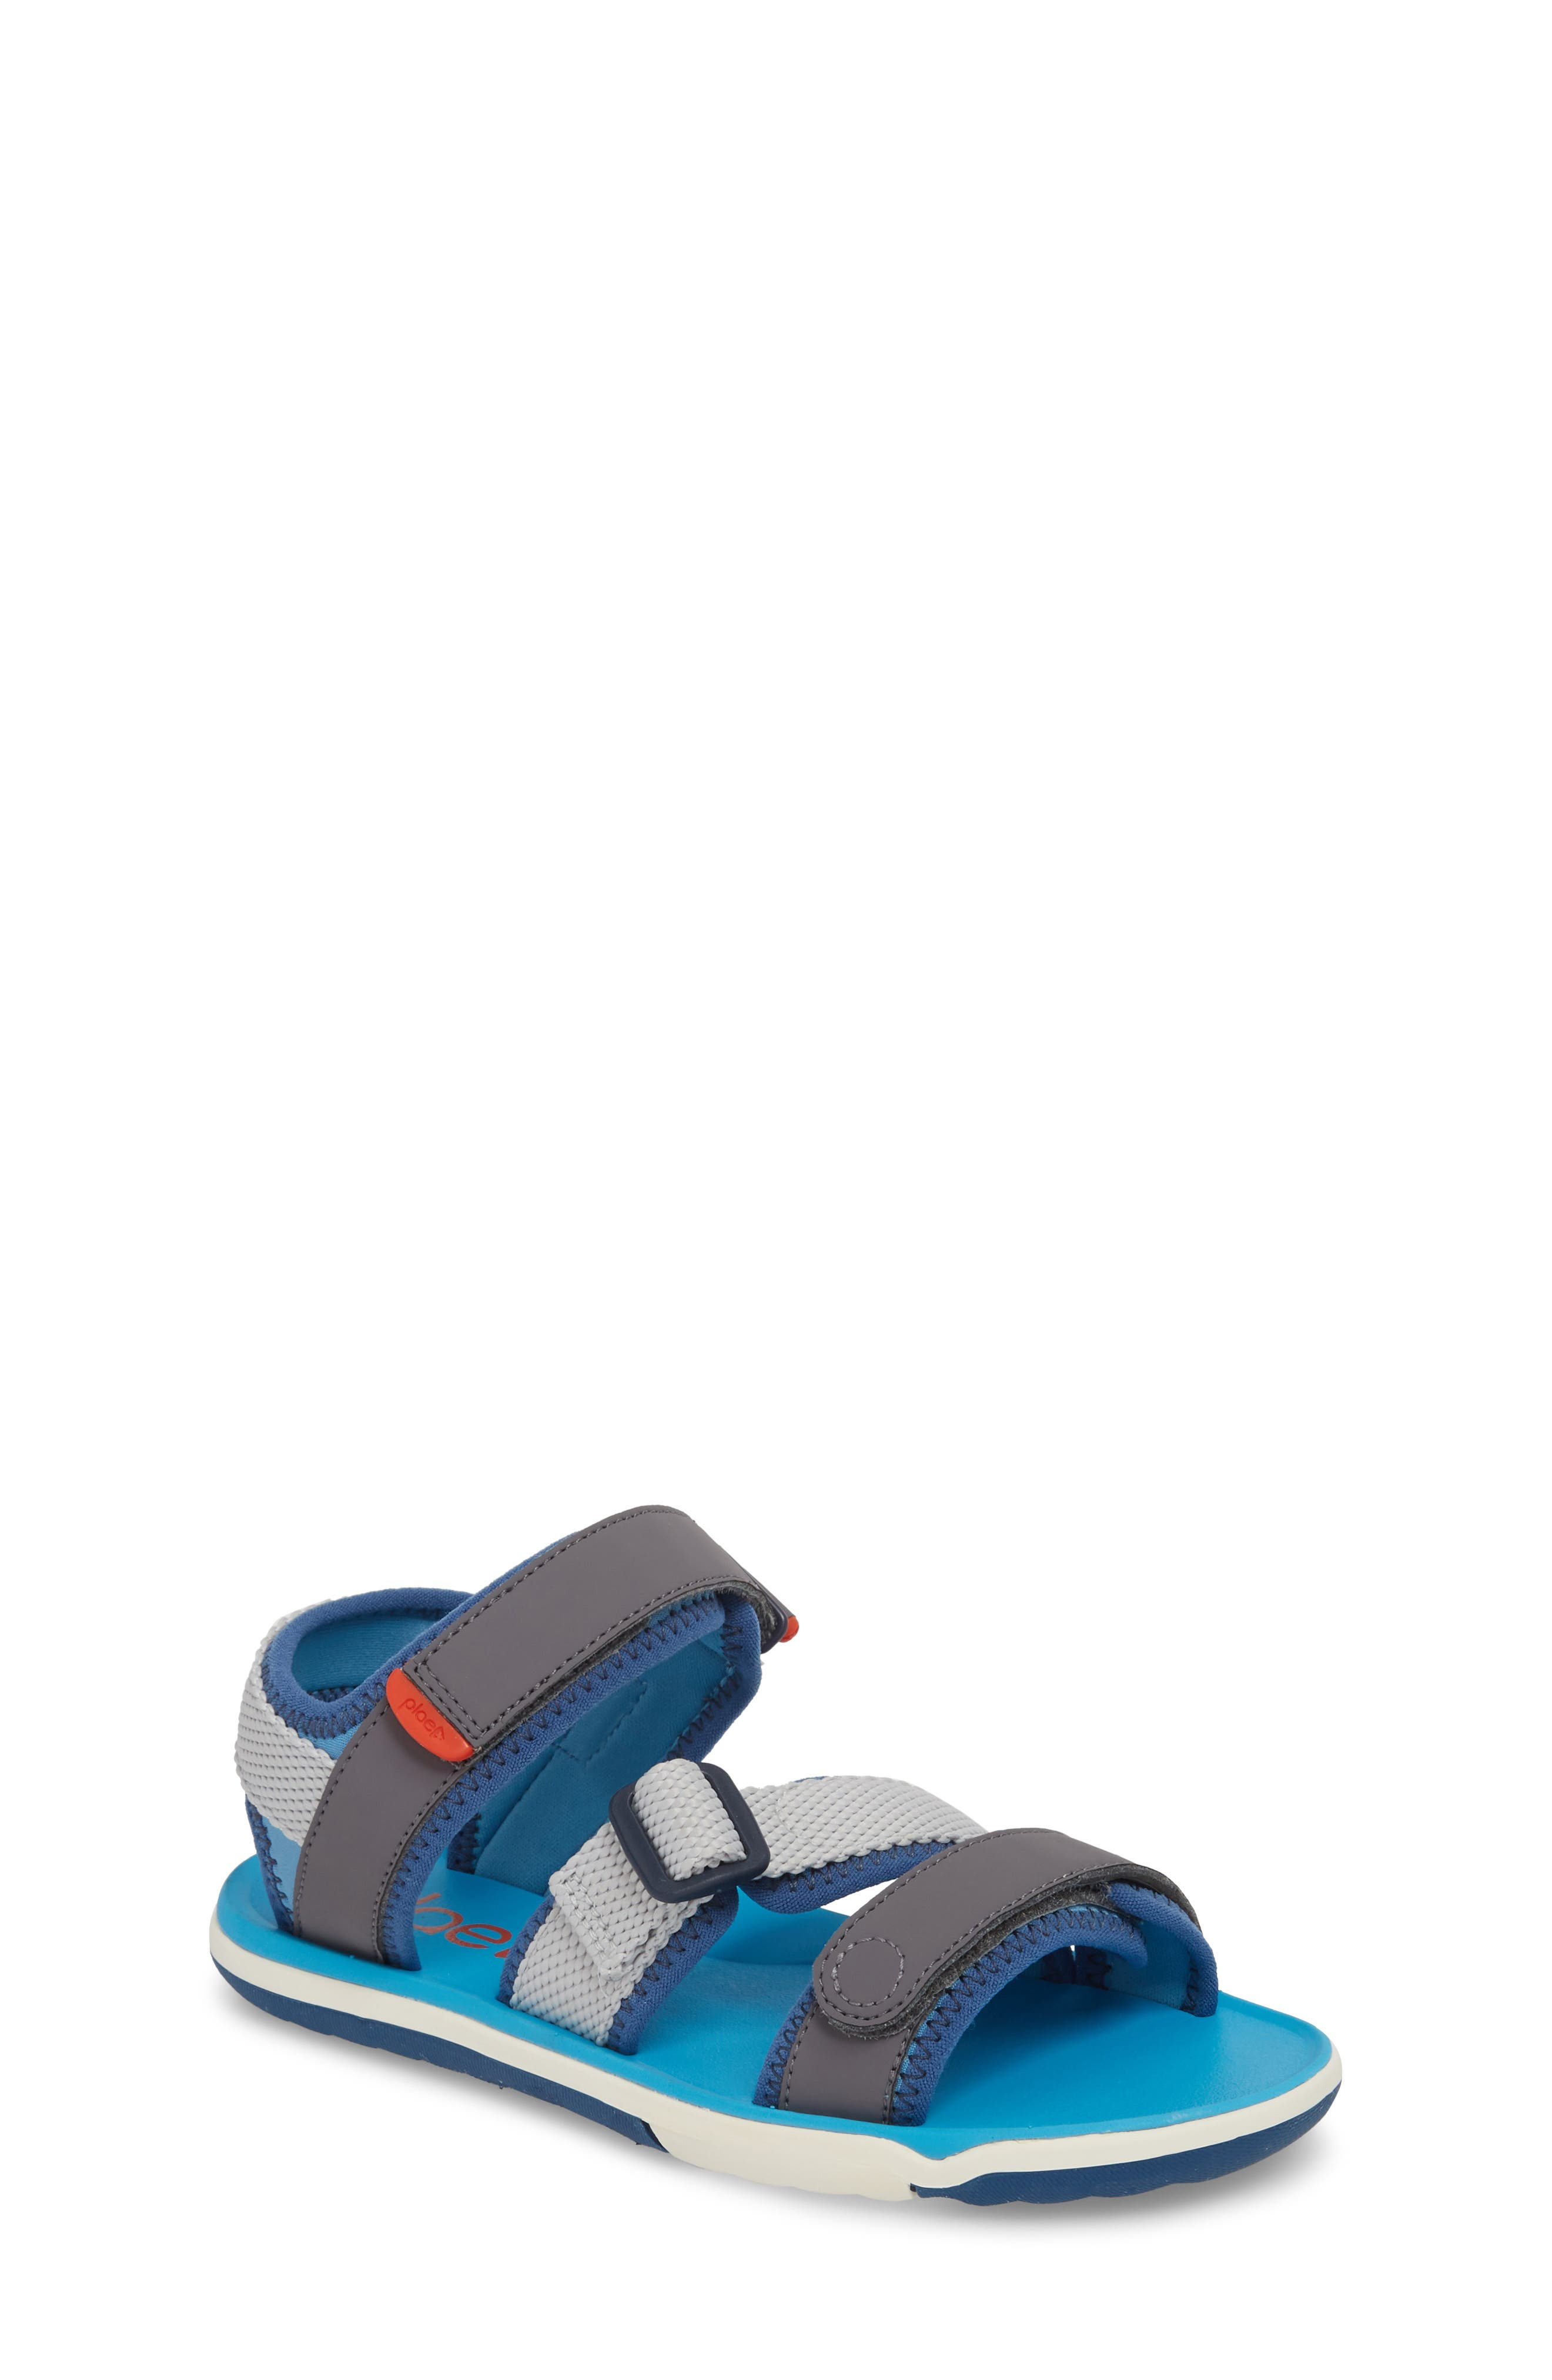 Wes Customizable Sandal,                             Main thumbnail 1, color,                             Aloha Blue